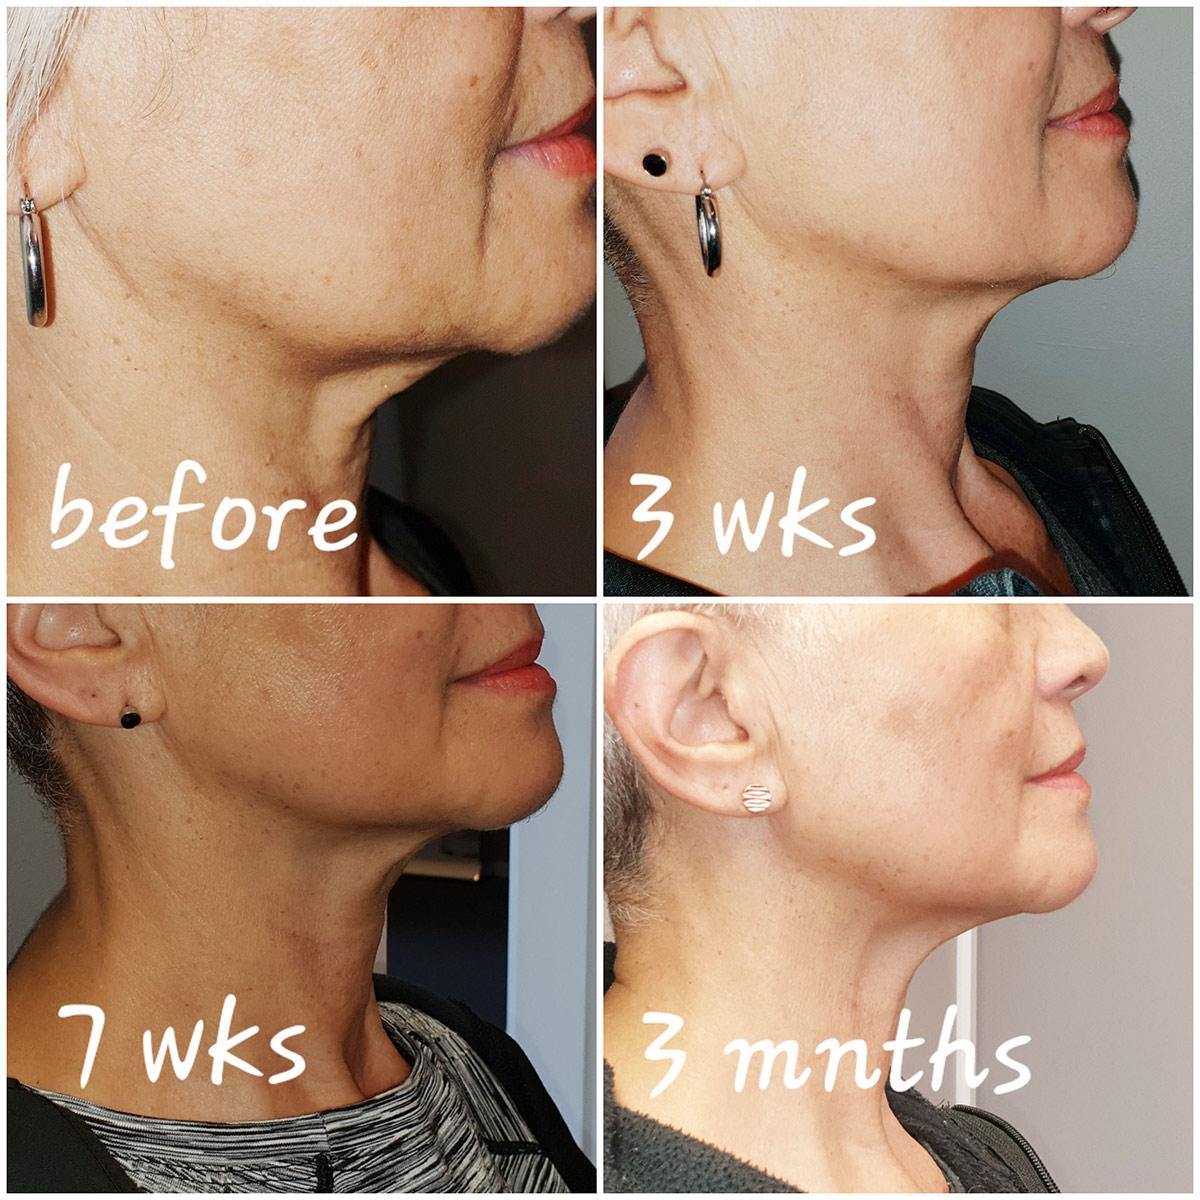 HIFU (High Intensity Focused Ultrasound) - Glow Beauty Therapy